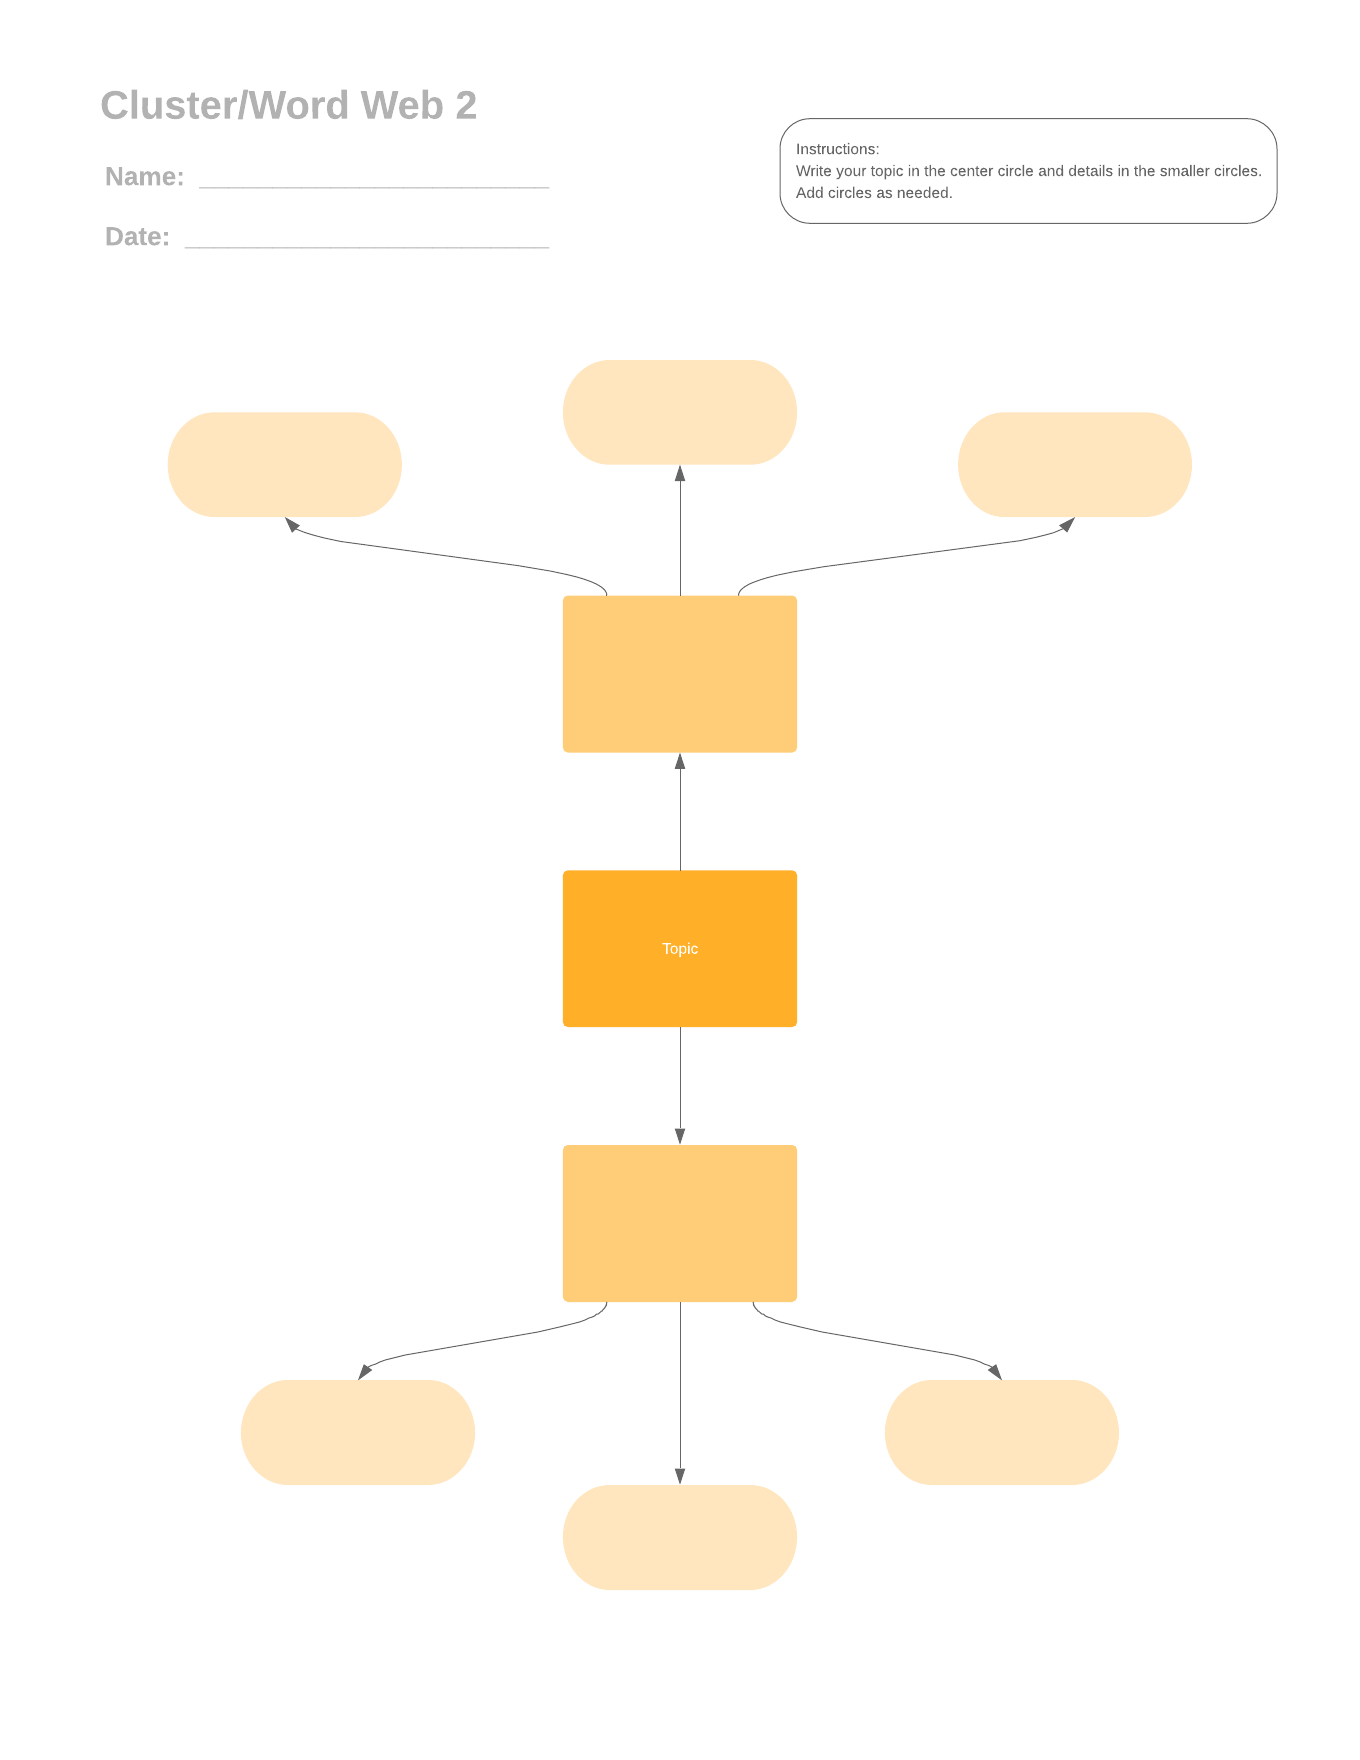 cluster word web version 2